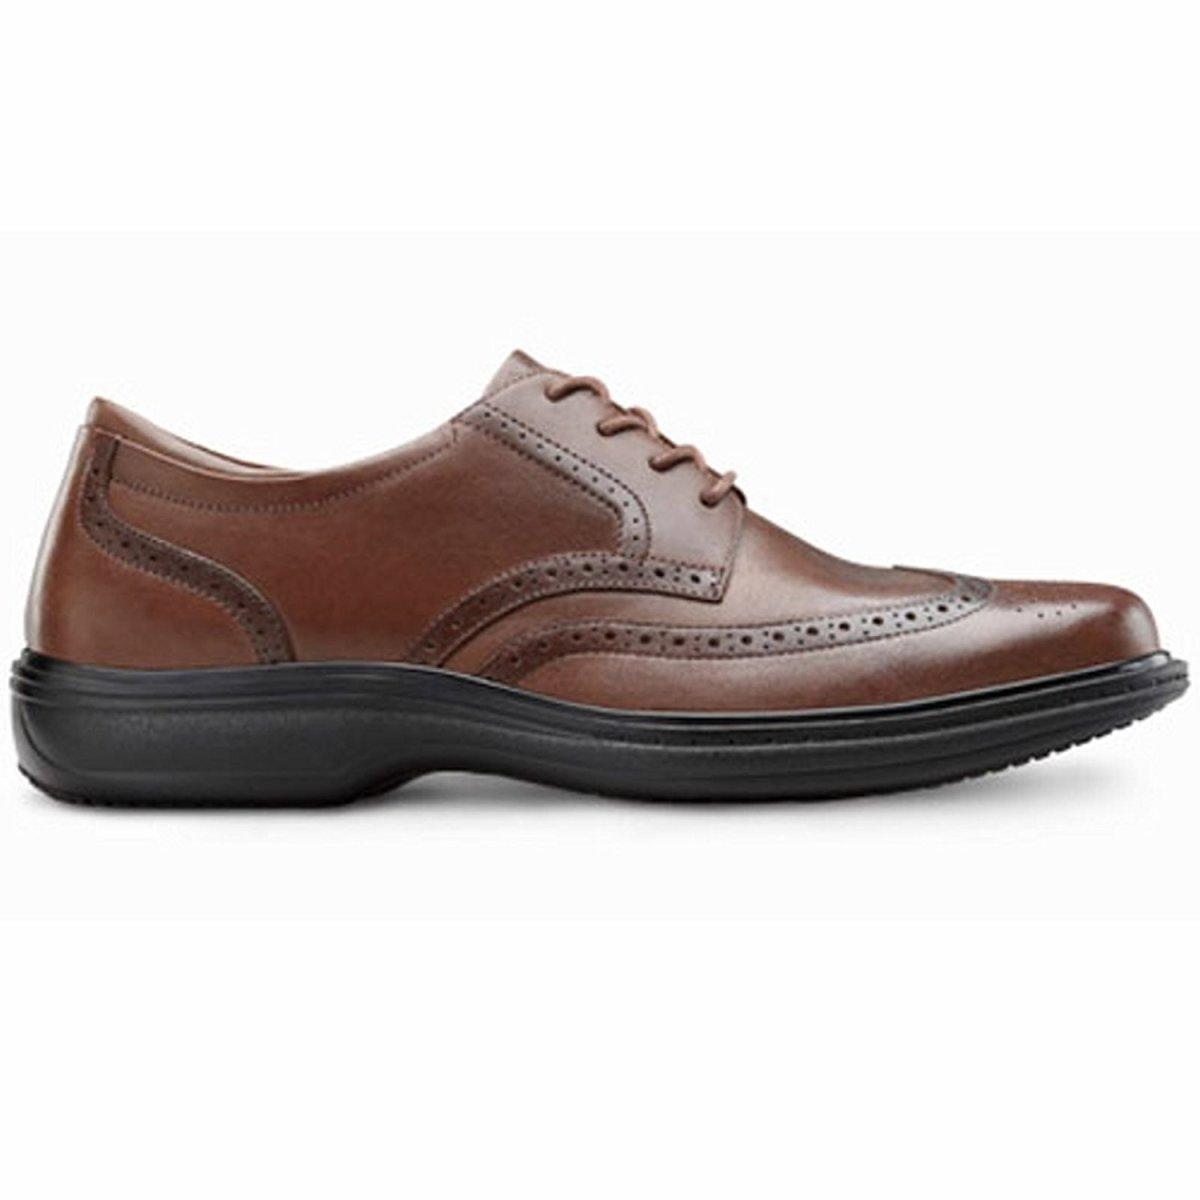 d5289150bd Stylish Men's Dress Shoes for Plantar Fasciitis and Diabetic Nerve ...